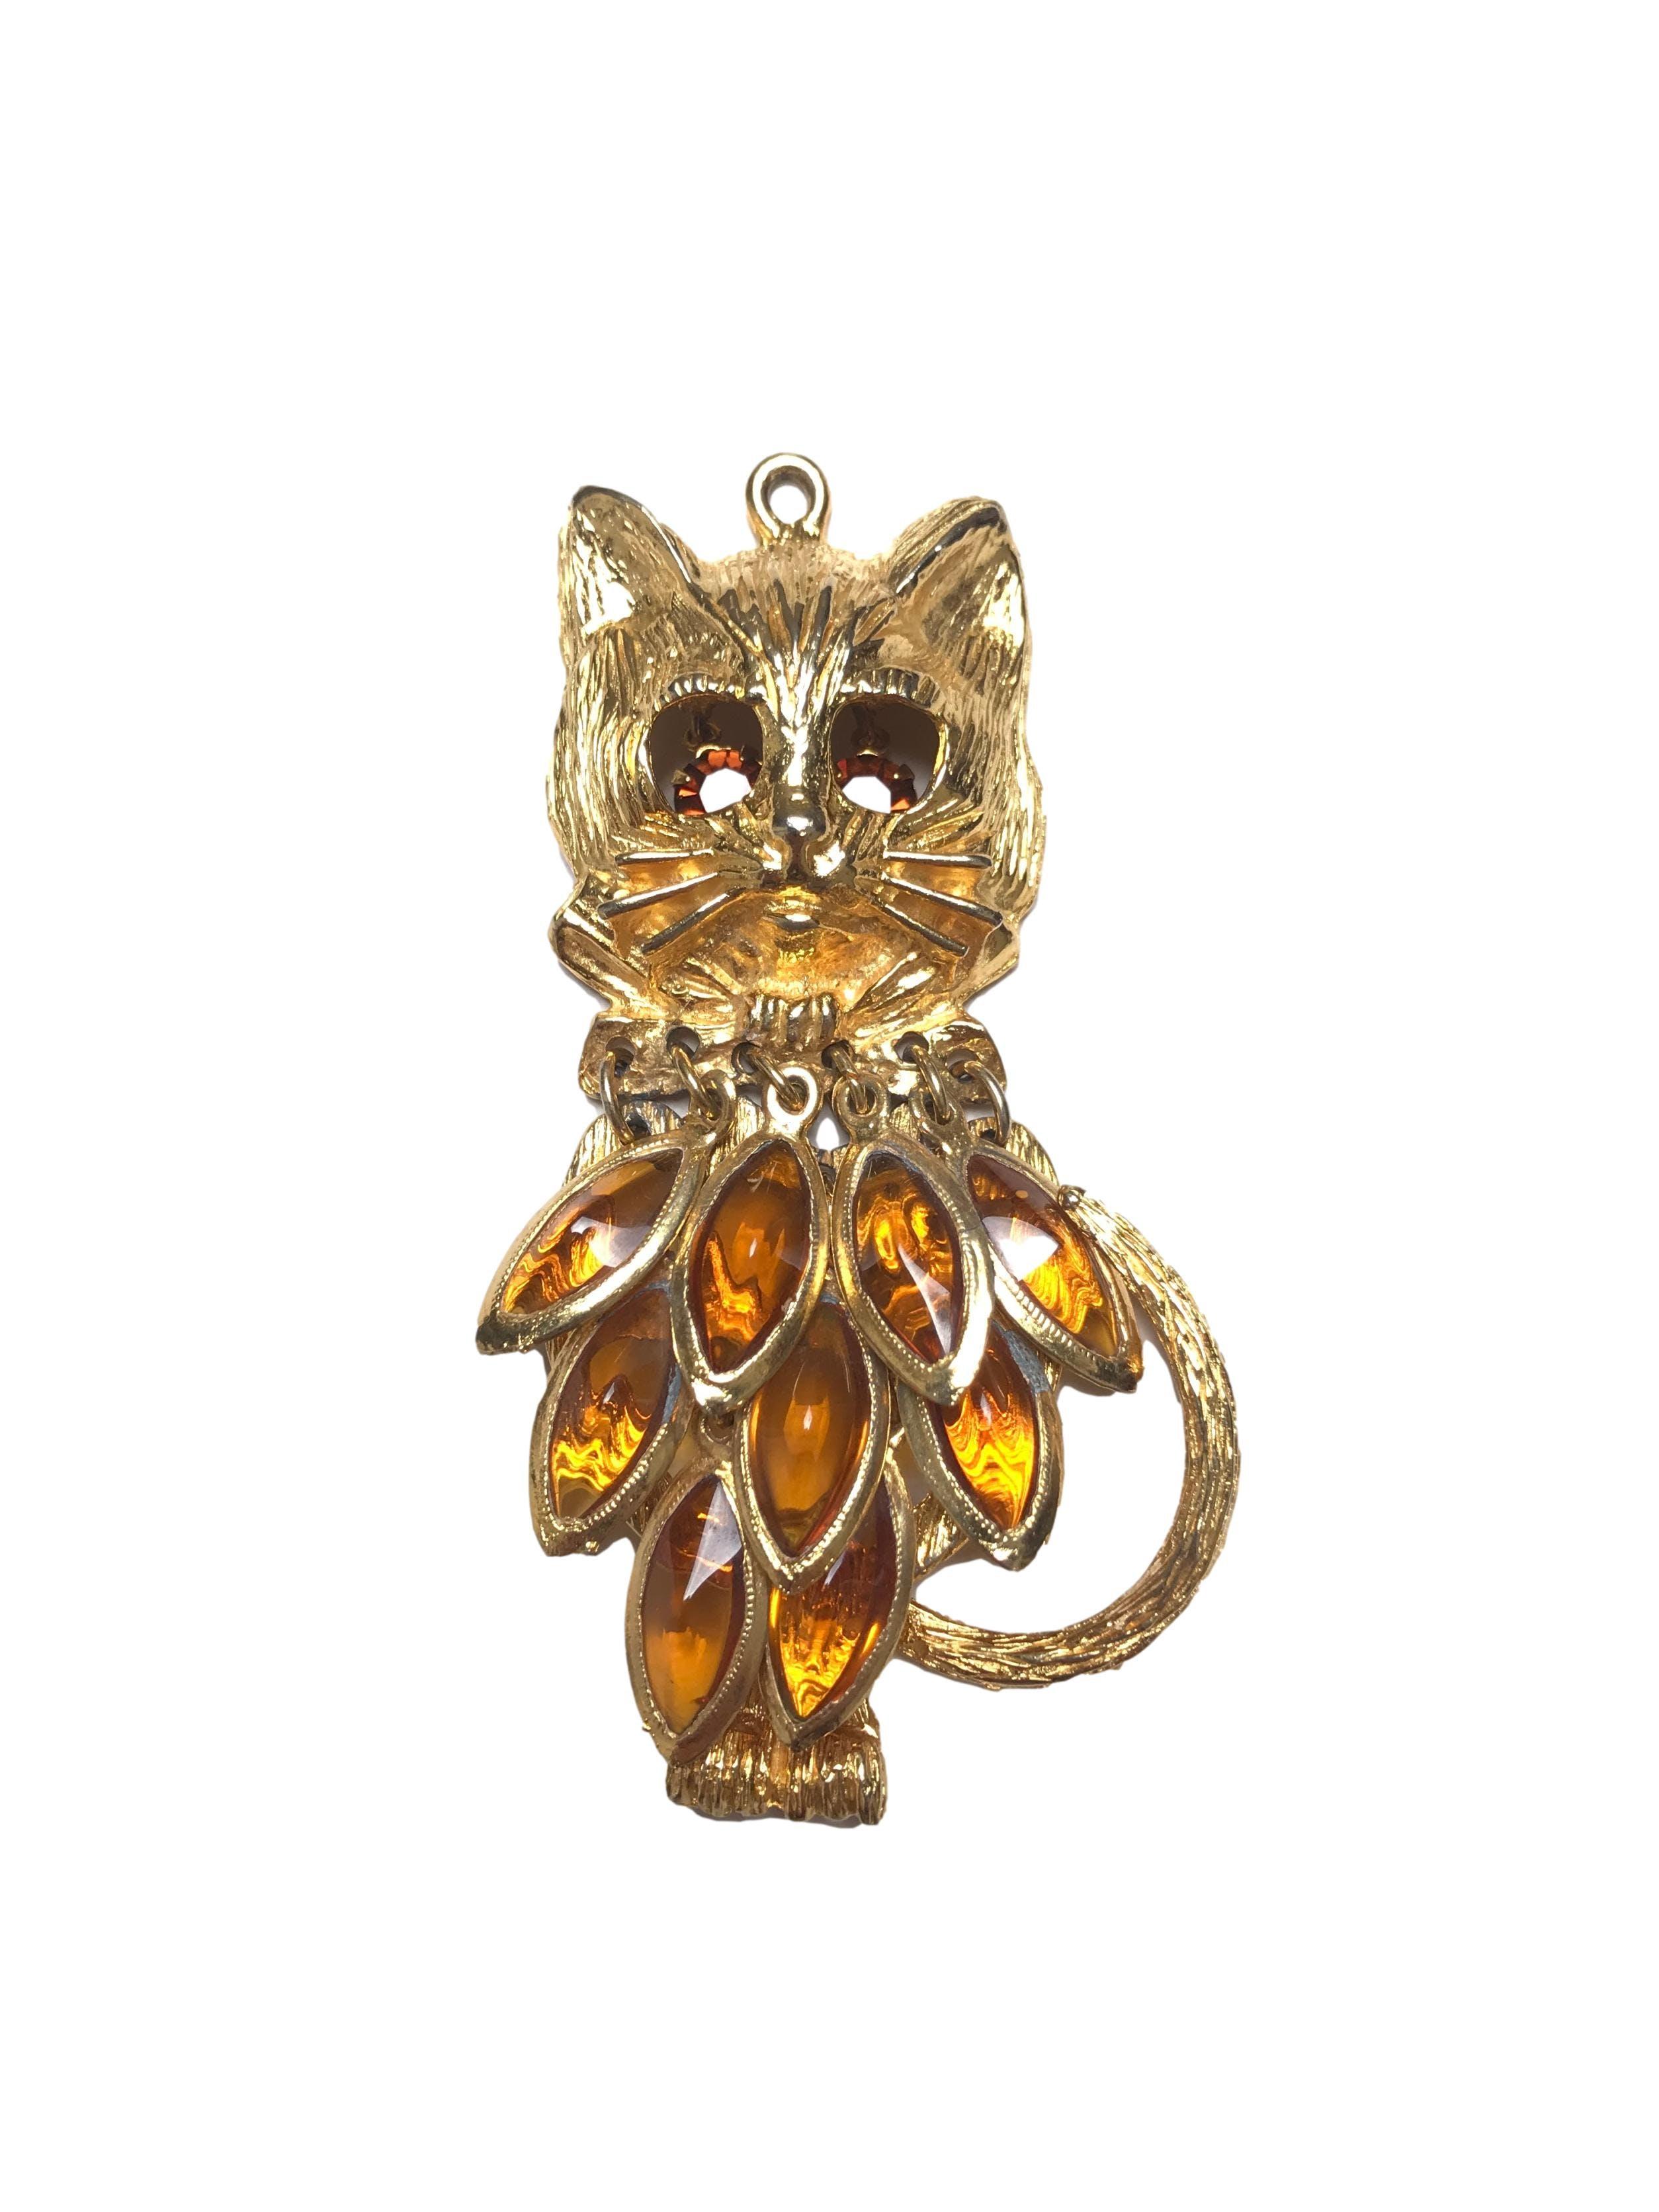 Dije vintage dorado buho/gato con pedrería colgante. Alto 9cm